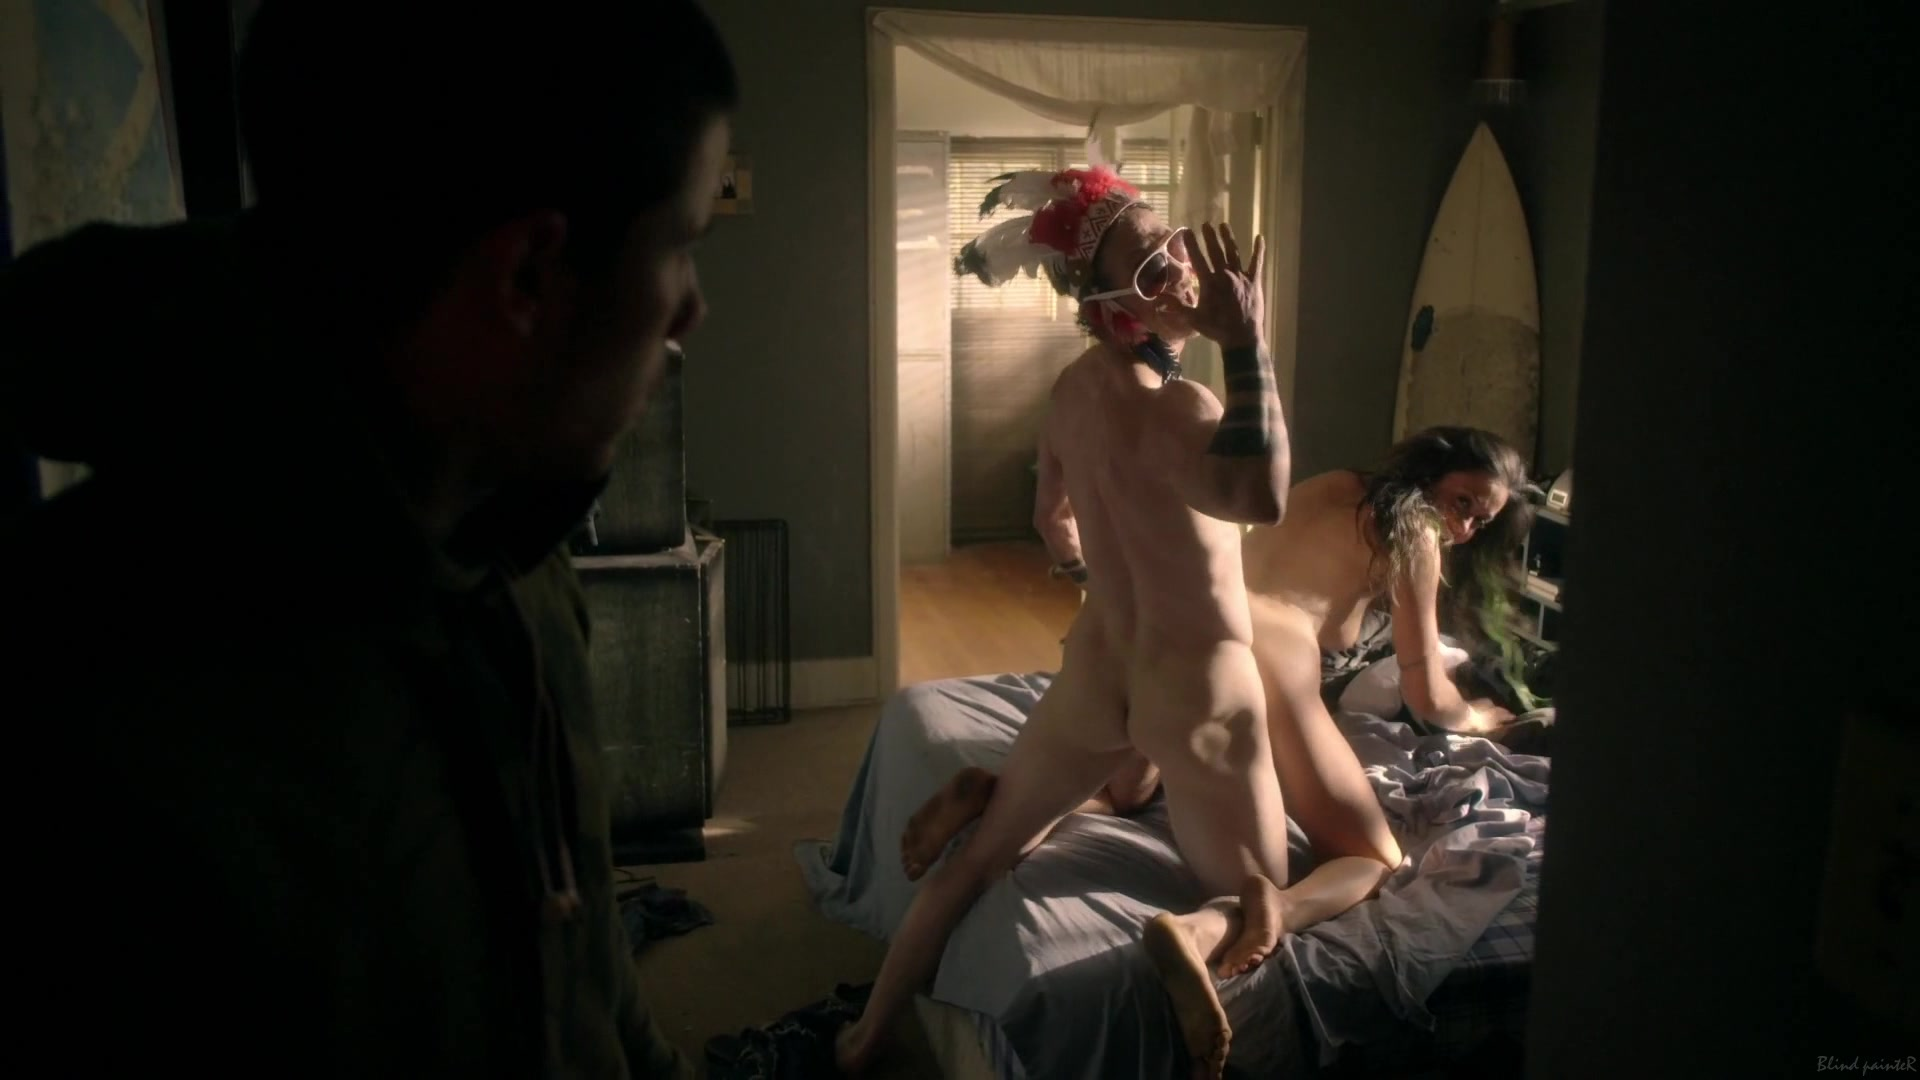 Alisa Sex Video alisa allapach - kingdom s01e01 (2014) video » best sexy